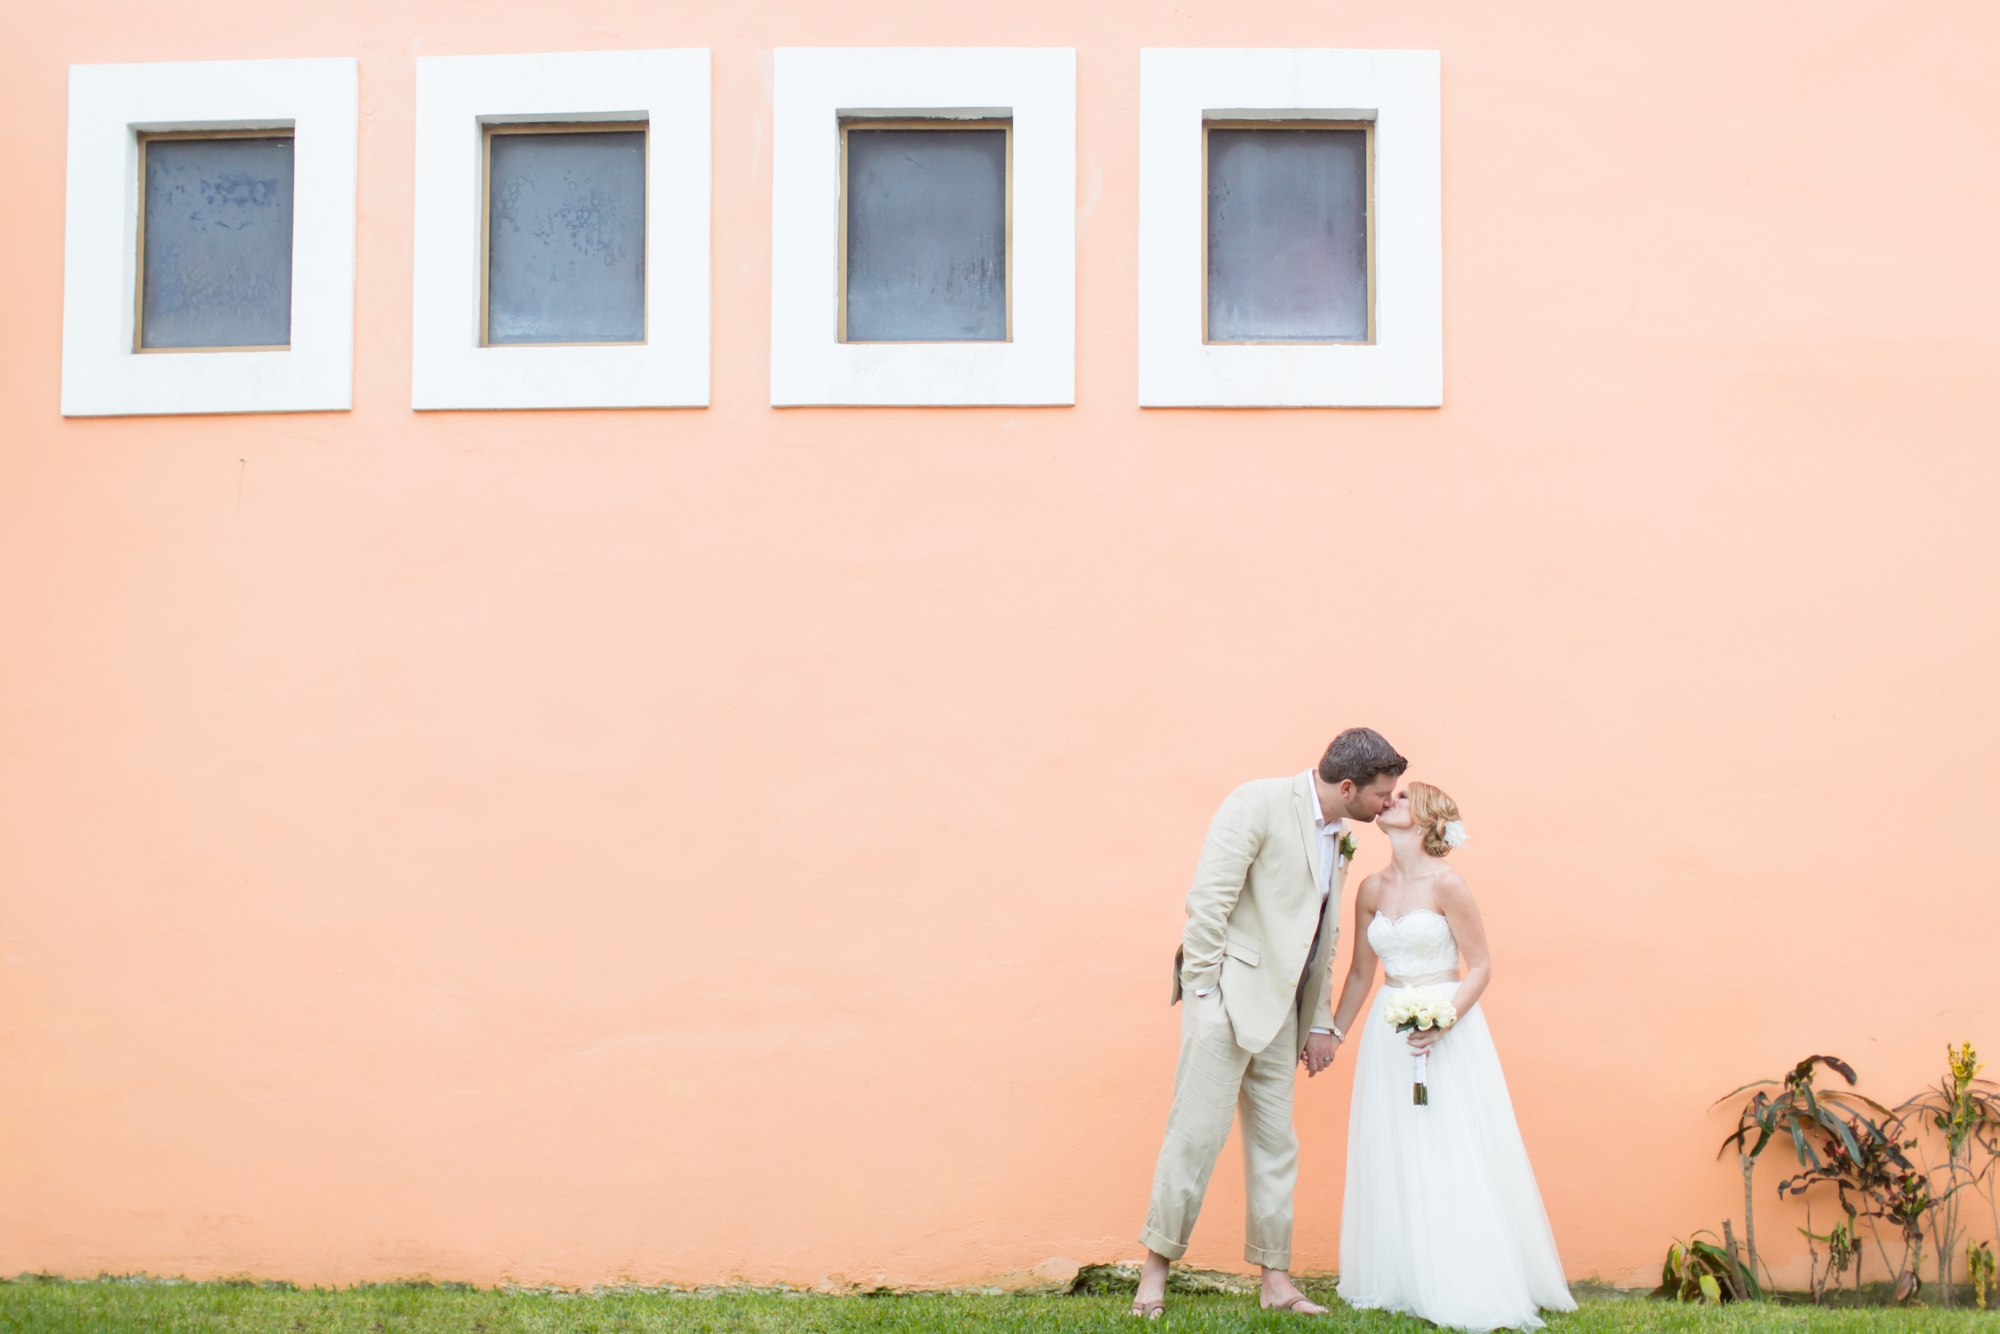 Morosoff Wedding 4-Bride & Groom Portraits-550_anna grace photography destination wedding photographer playa del carmen mexico photo.jpg